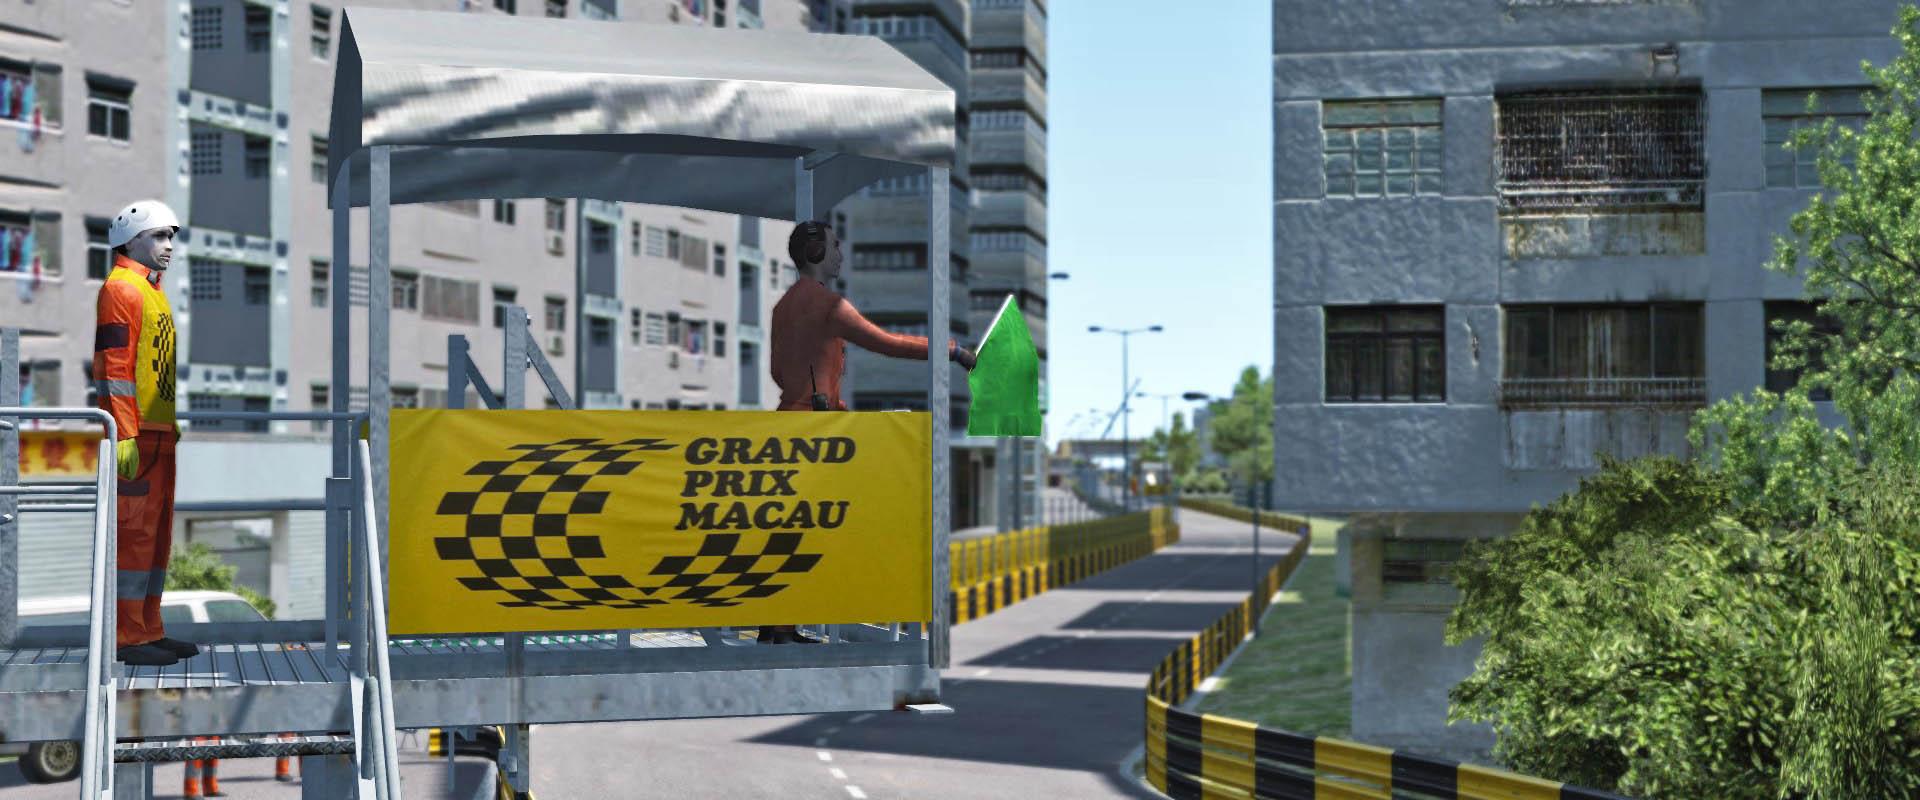 Macau Preview